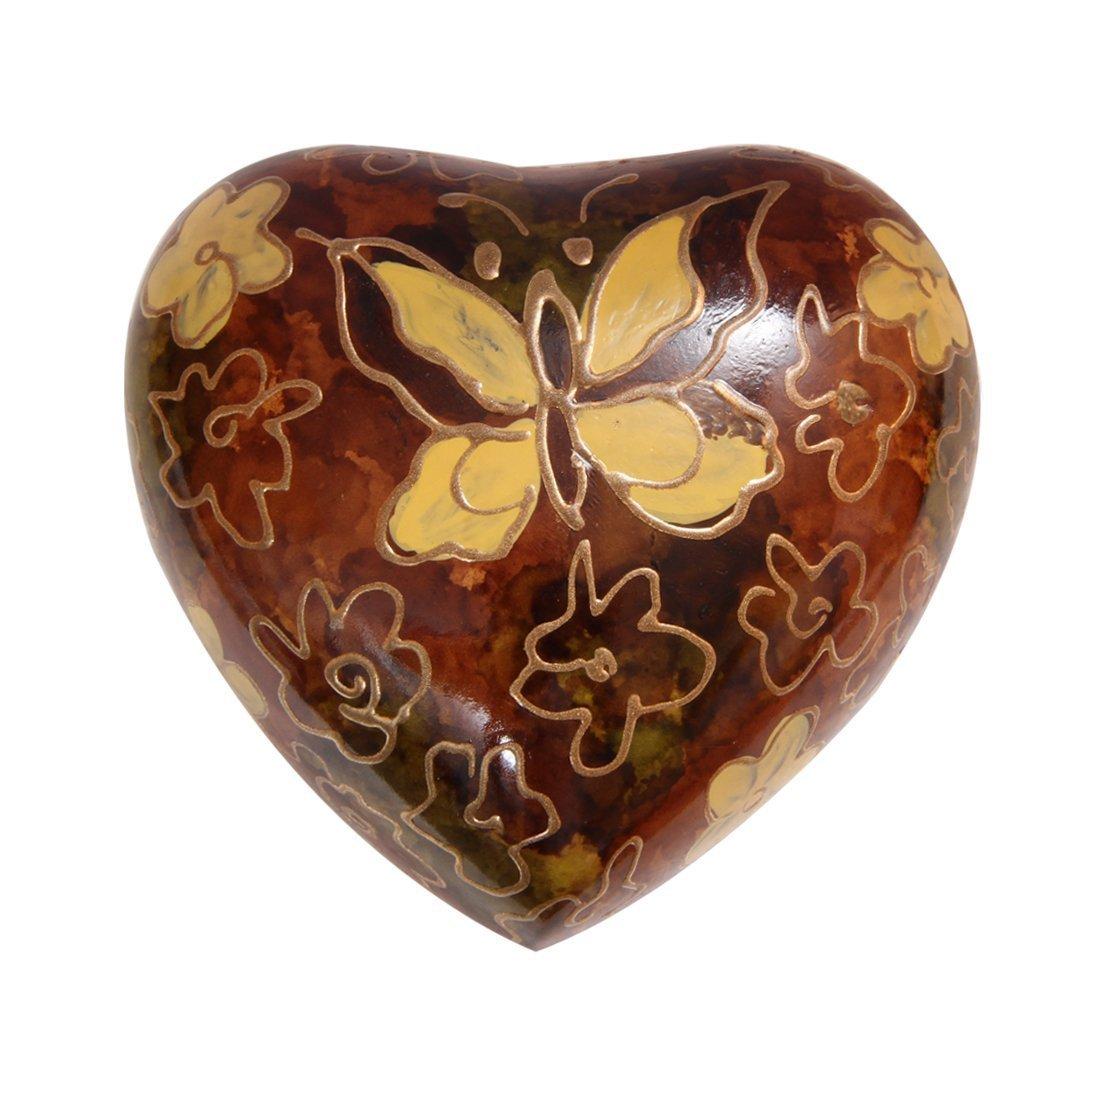 Baby Heart Cremation Urns